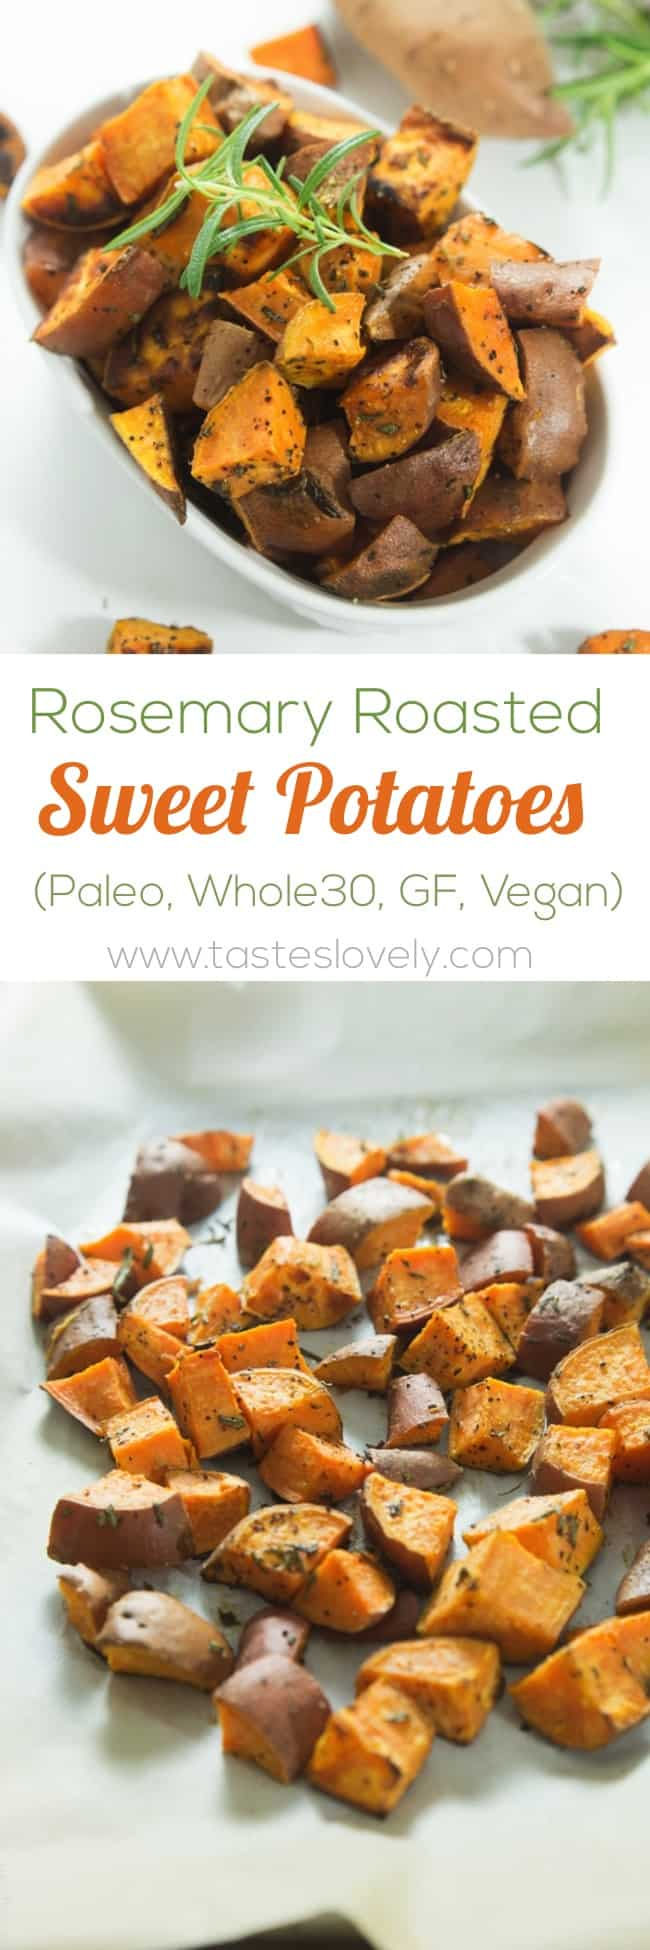 Rosemary Roasted Sweet Potatoes #paleo #whole30 #glutenfree #vegan